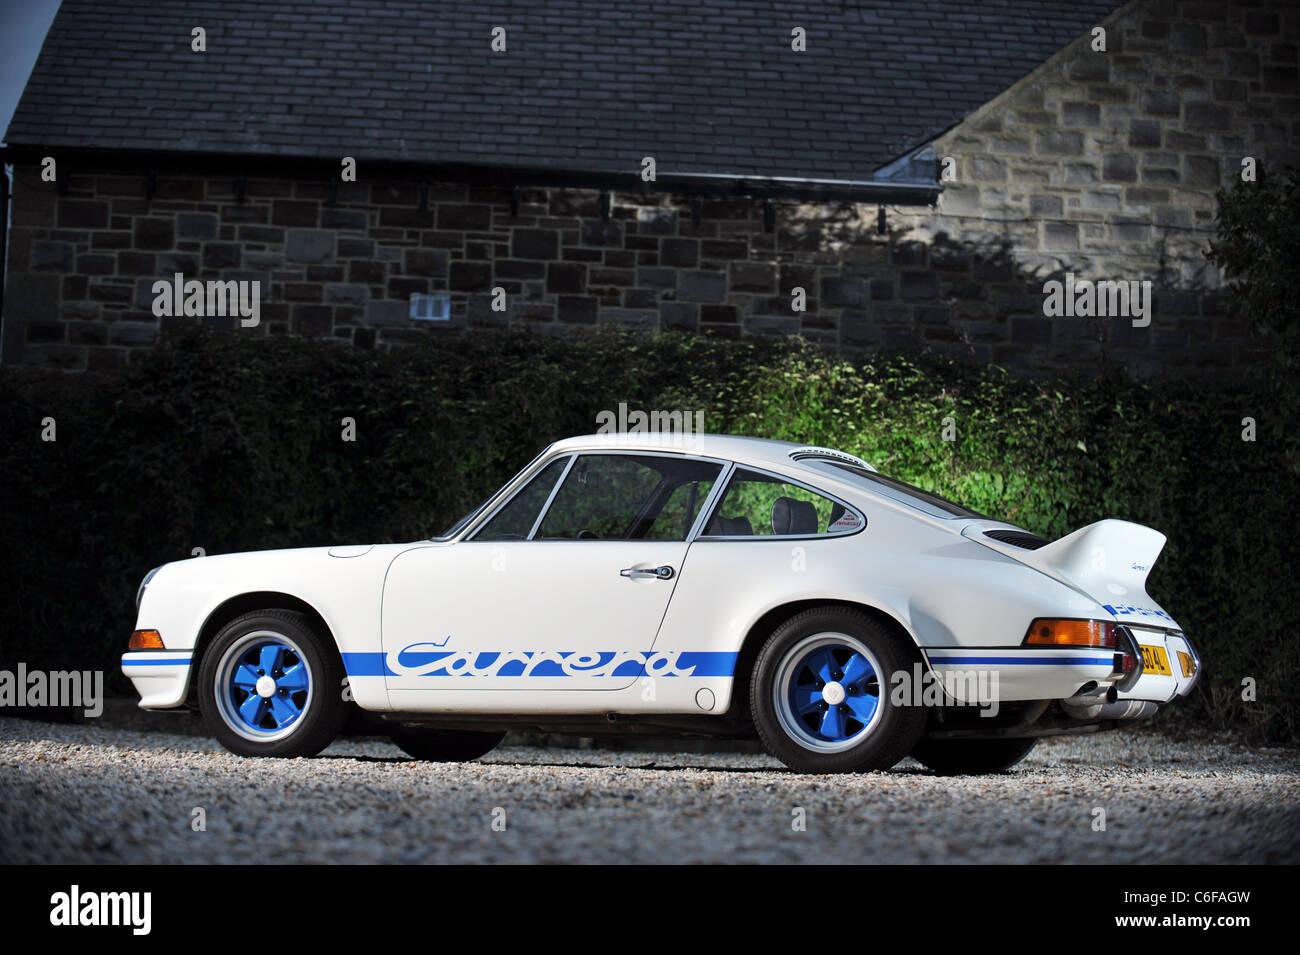 1973 Porsche 911 Carrera Rs 2 7 Litre Lightweight Coupe Stock Photo Alamy